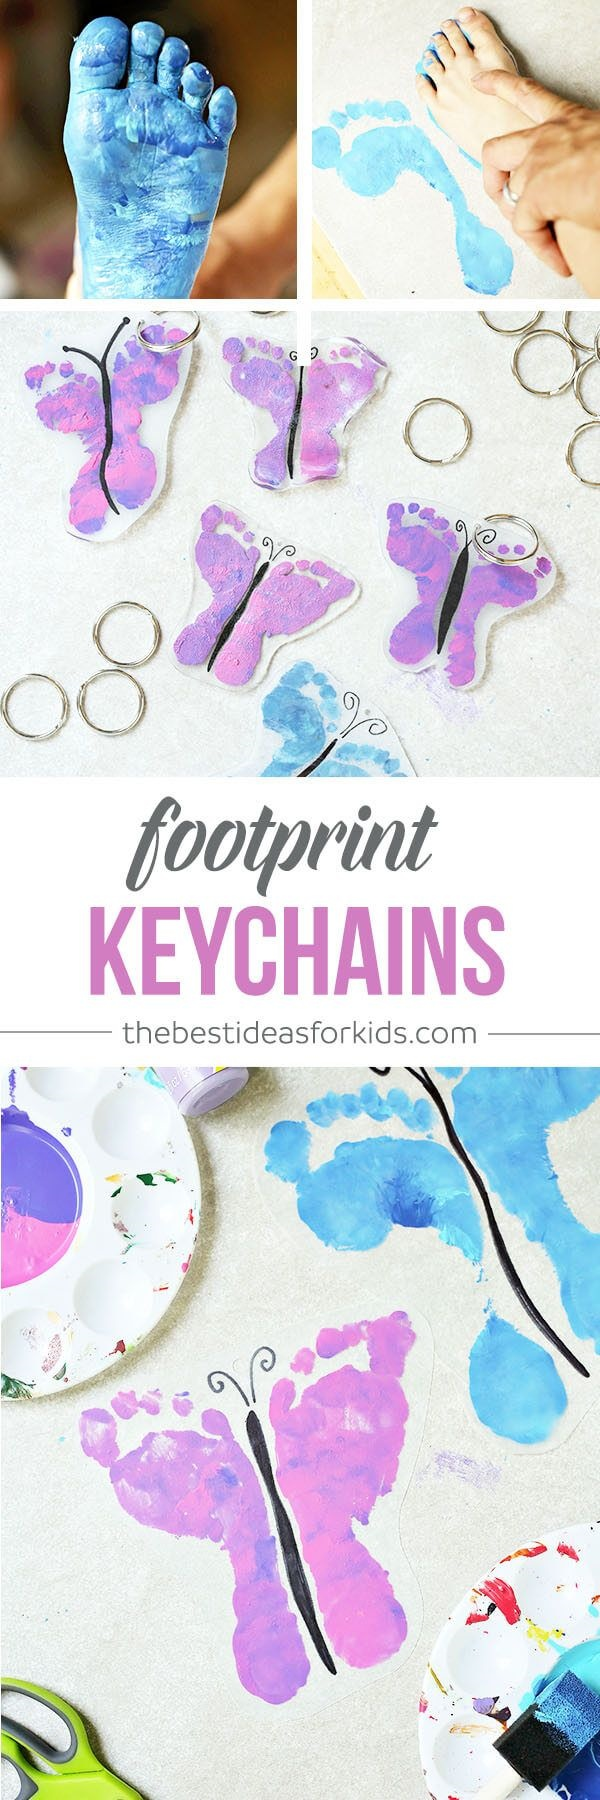 DIY Keychain Ideas To Make Your Friends